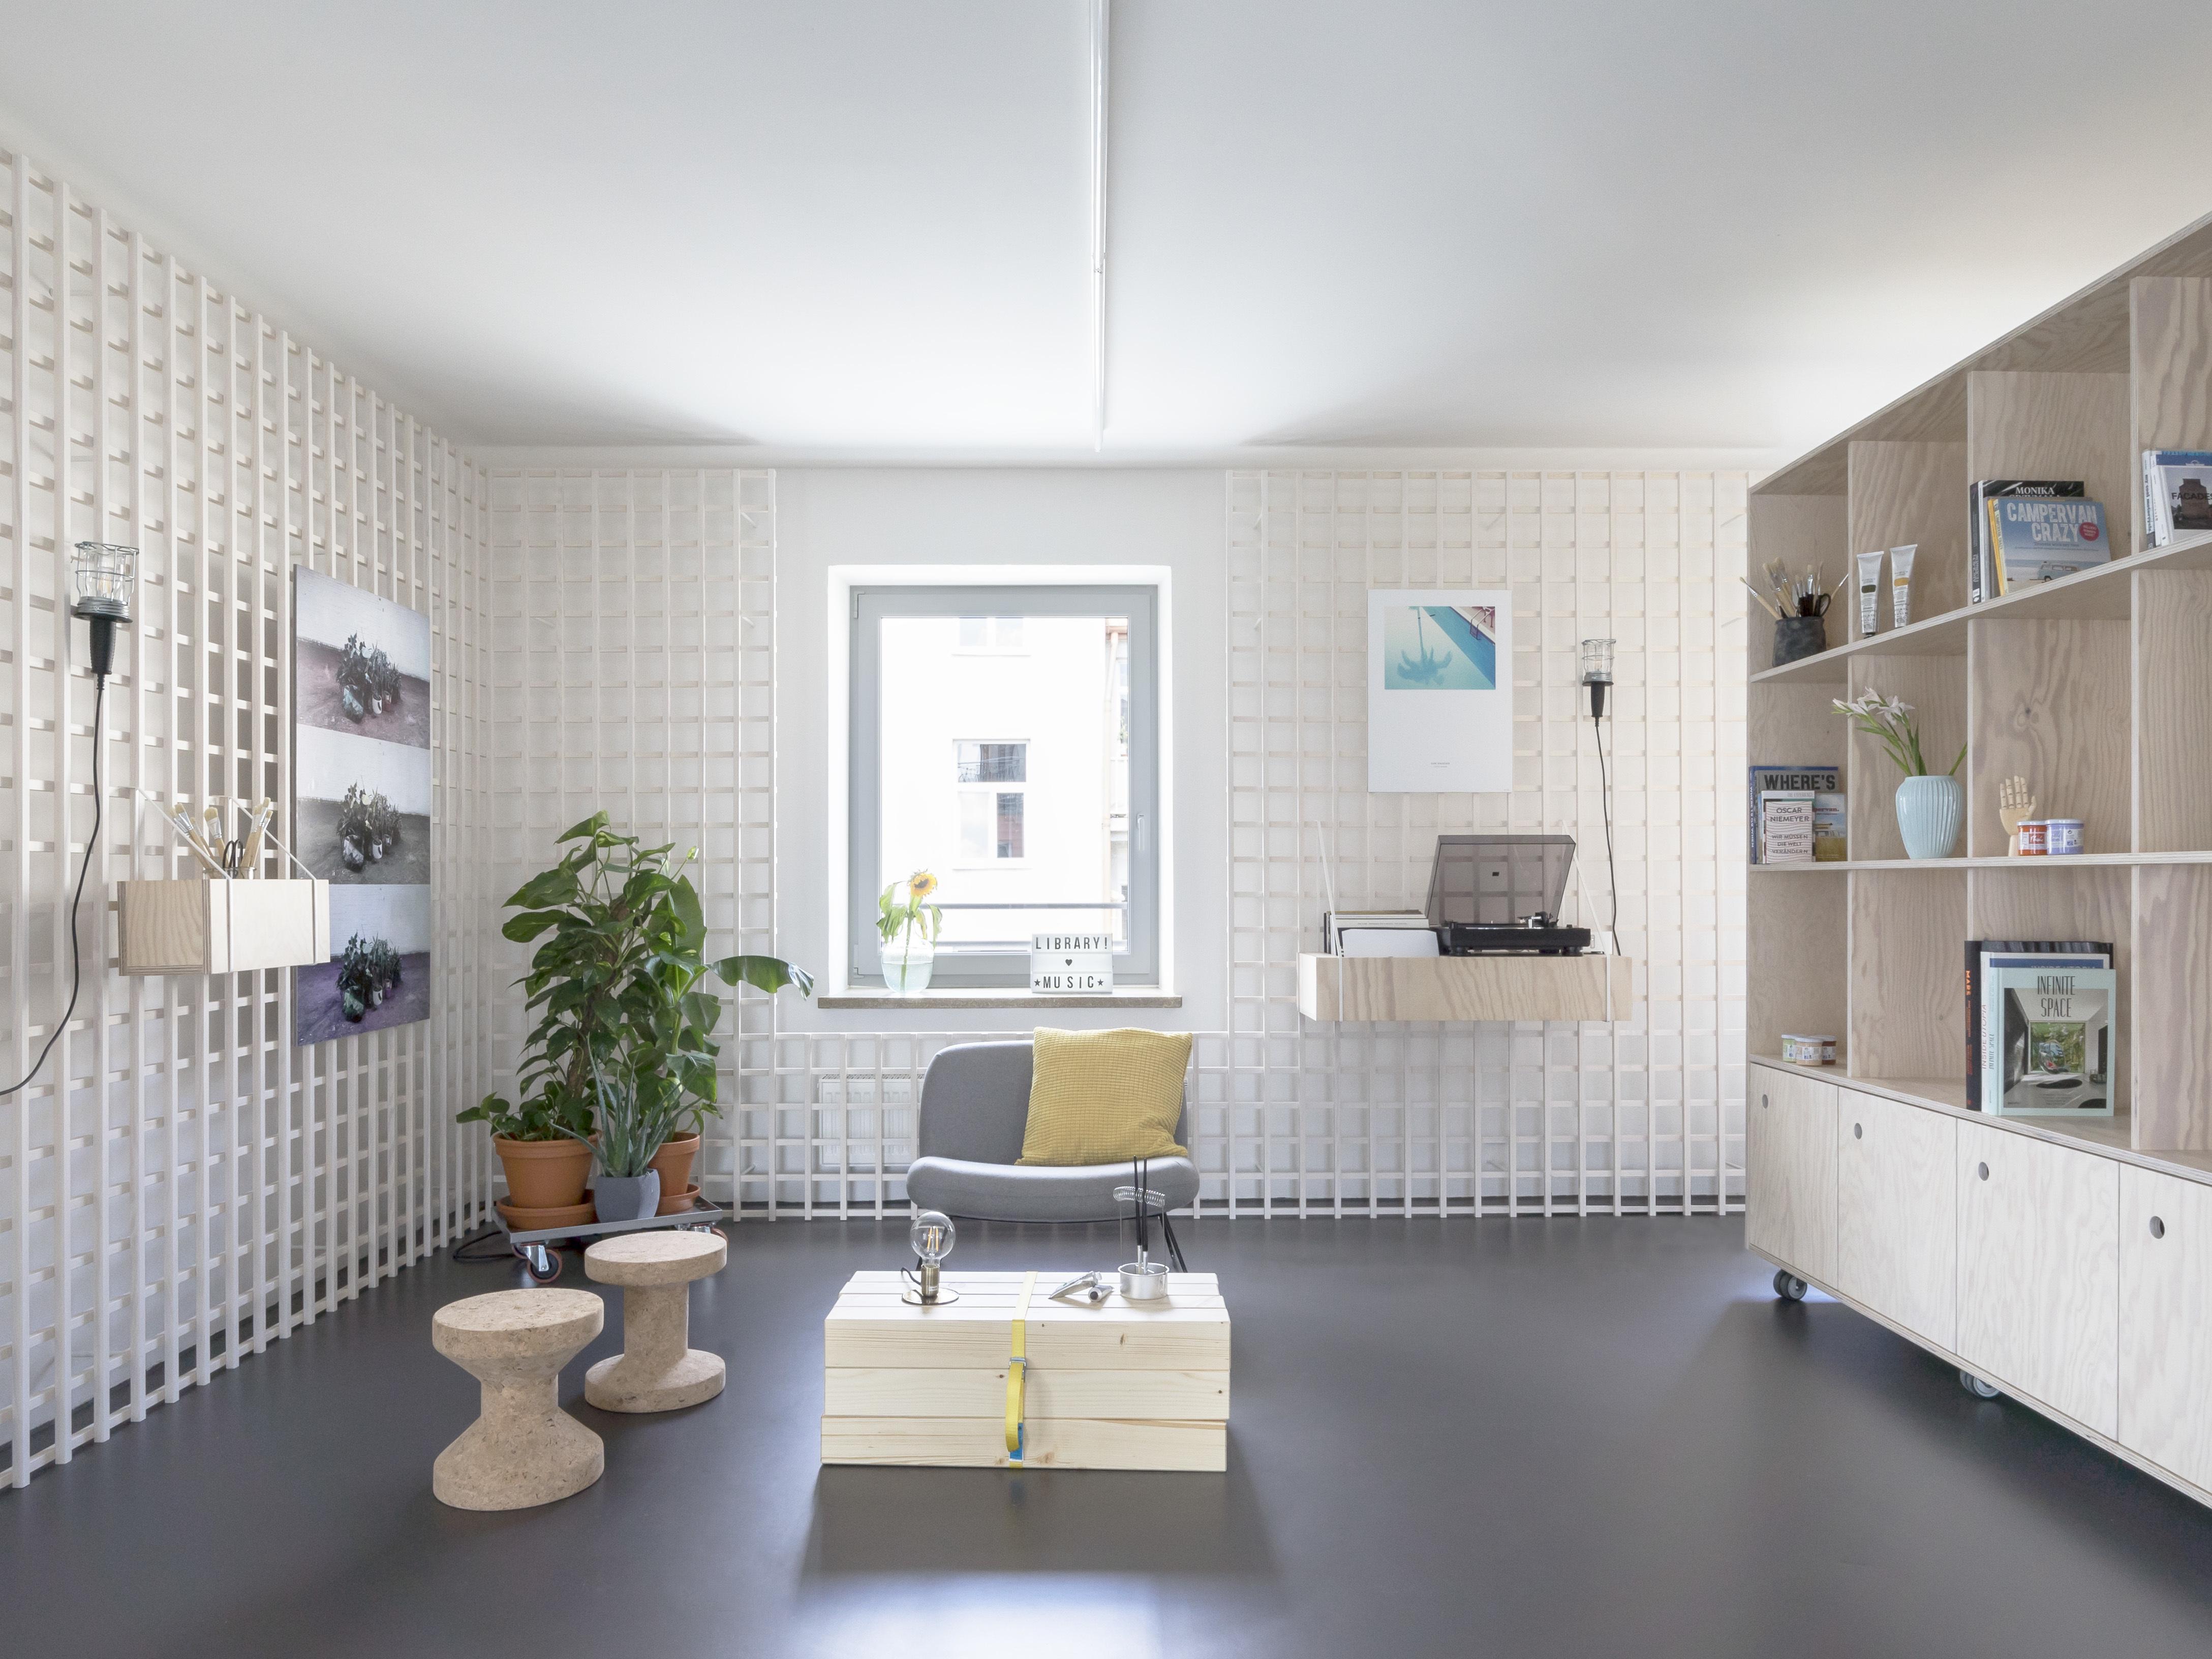 With Untreated Wood The Architecture Studio Von M Kept Interior Design Of Creative Space Deliberately Unrefined